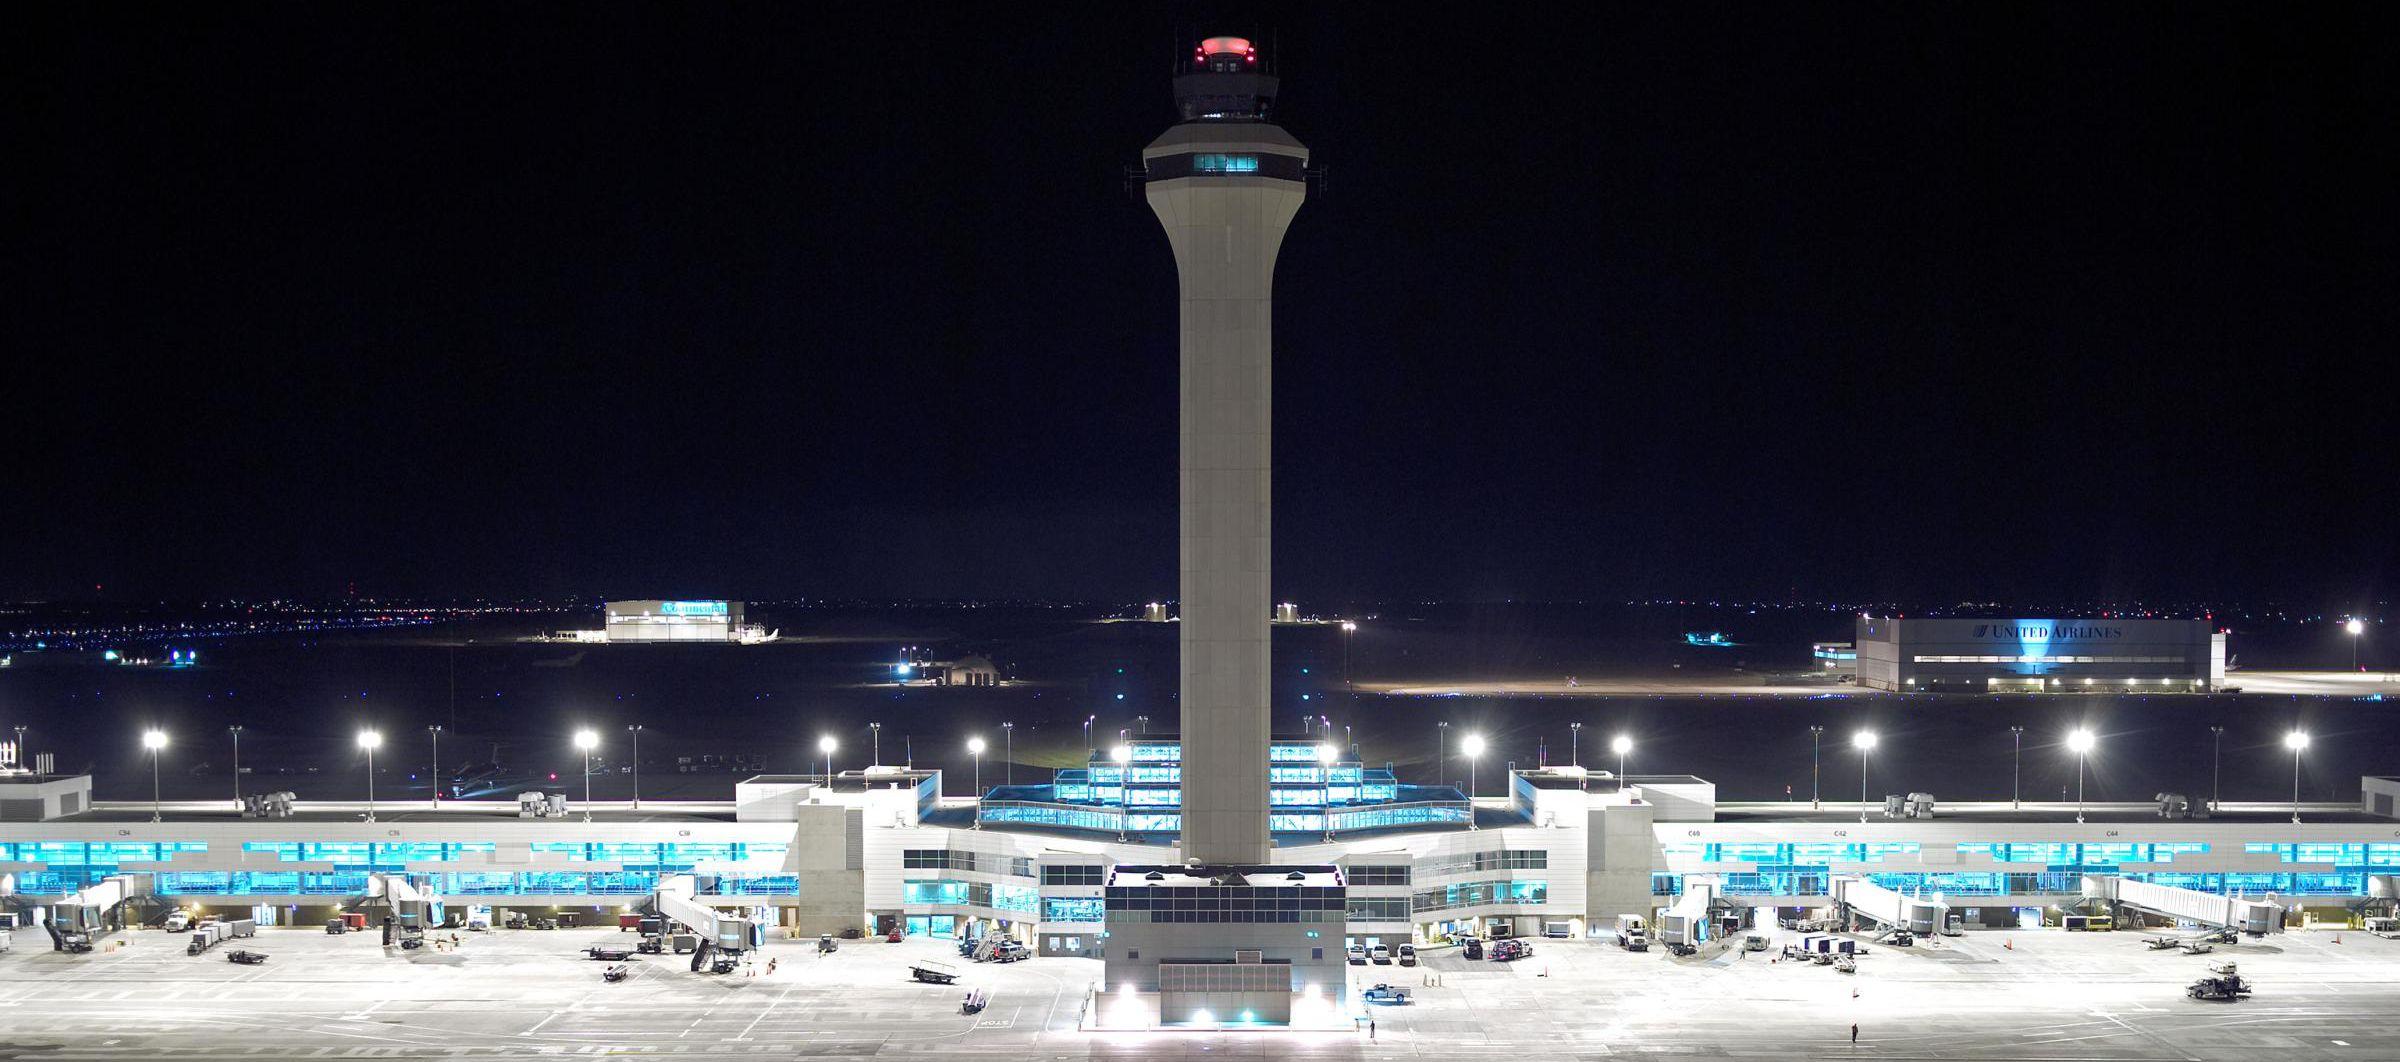 Nonstop Destinations | Denver International Airport